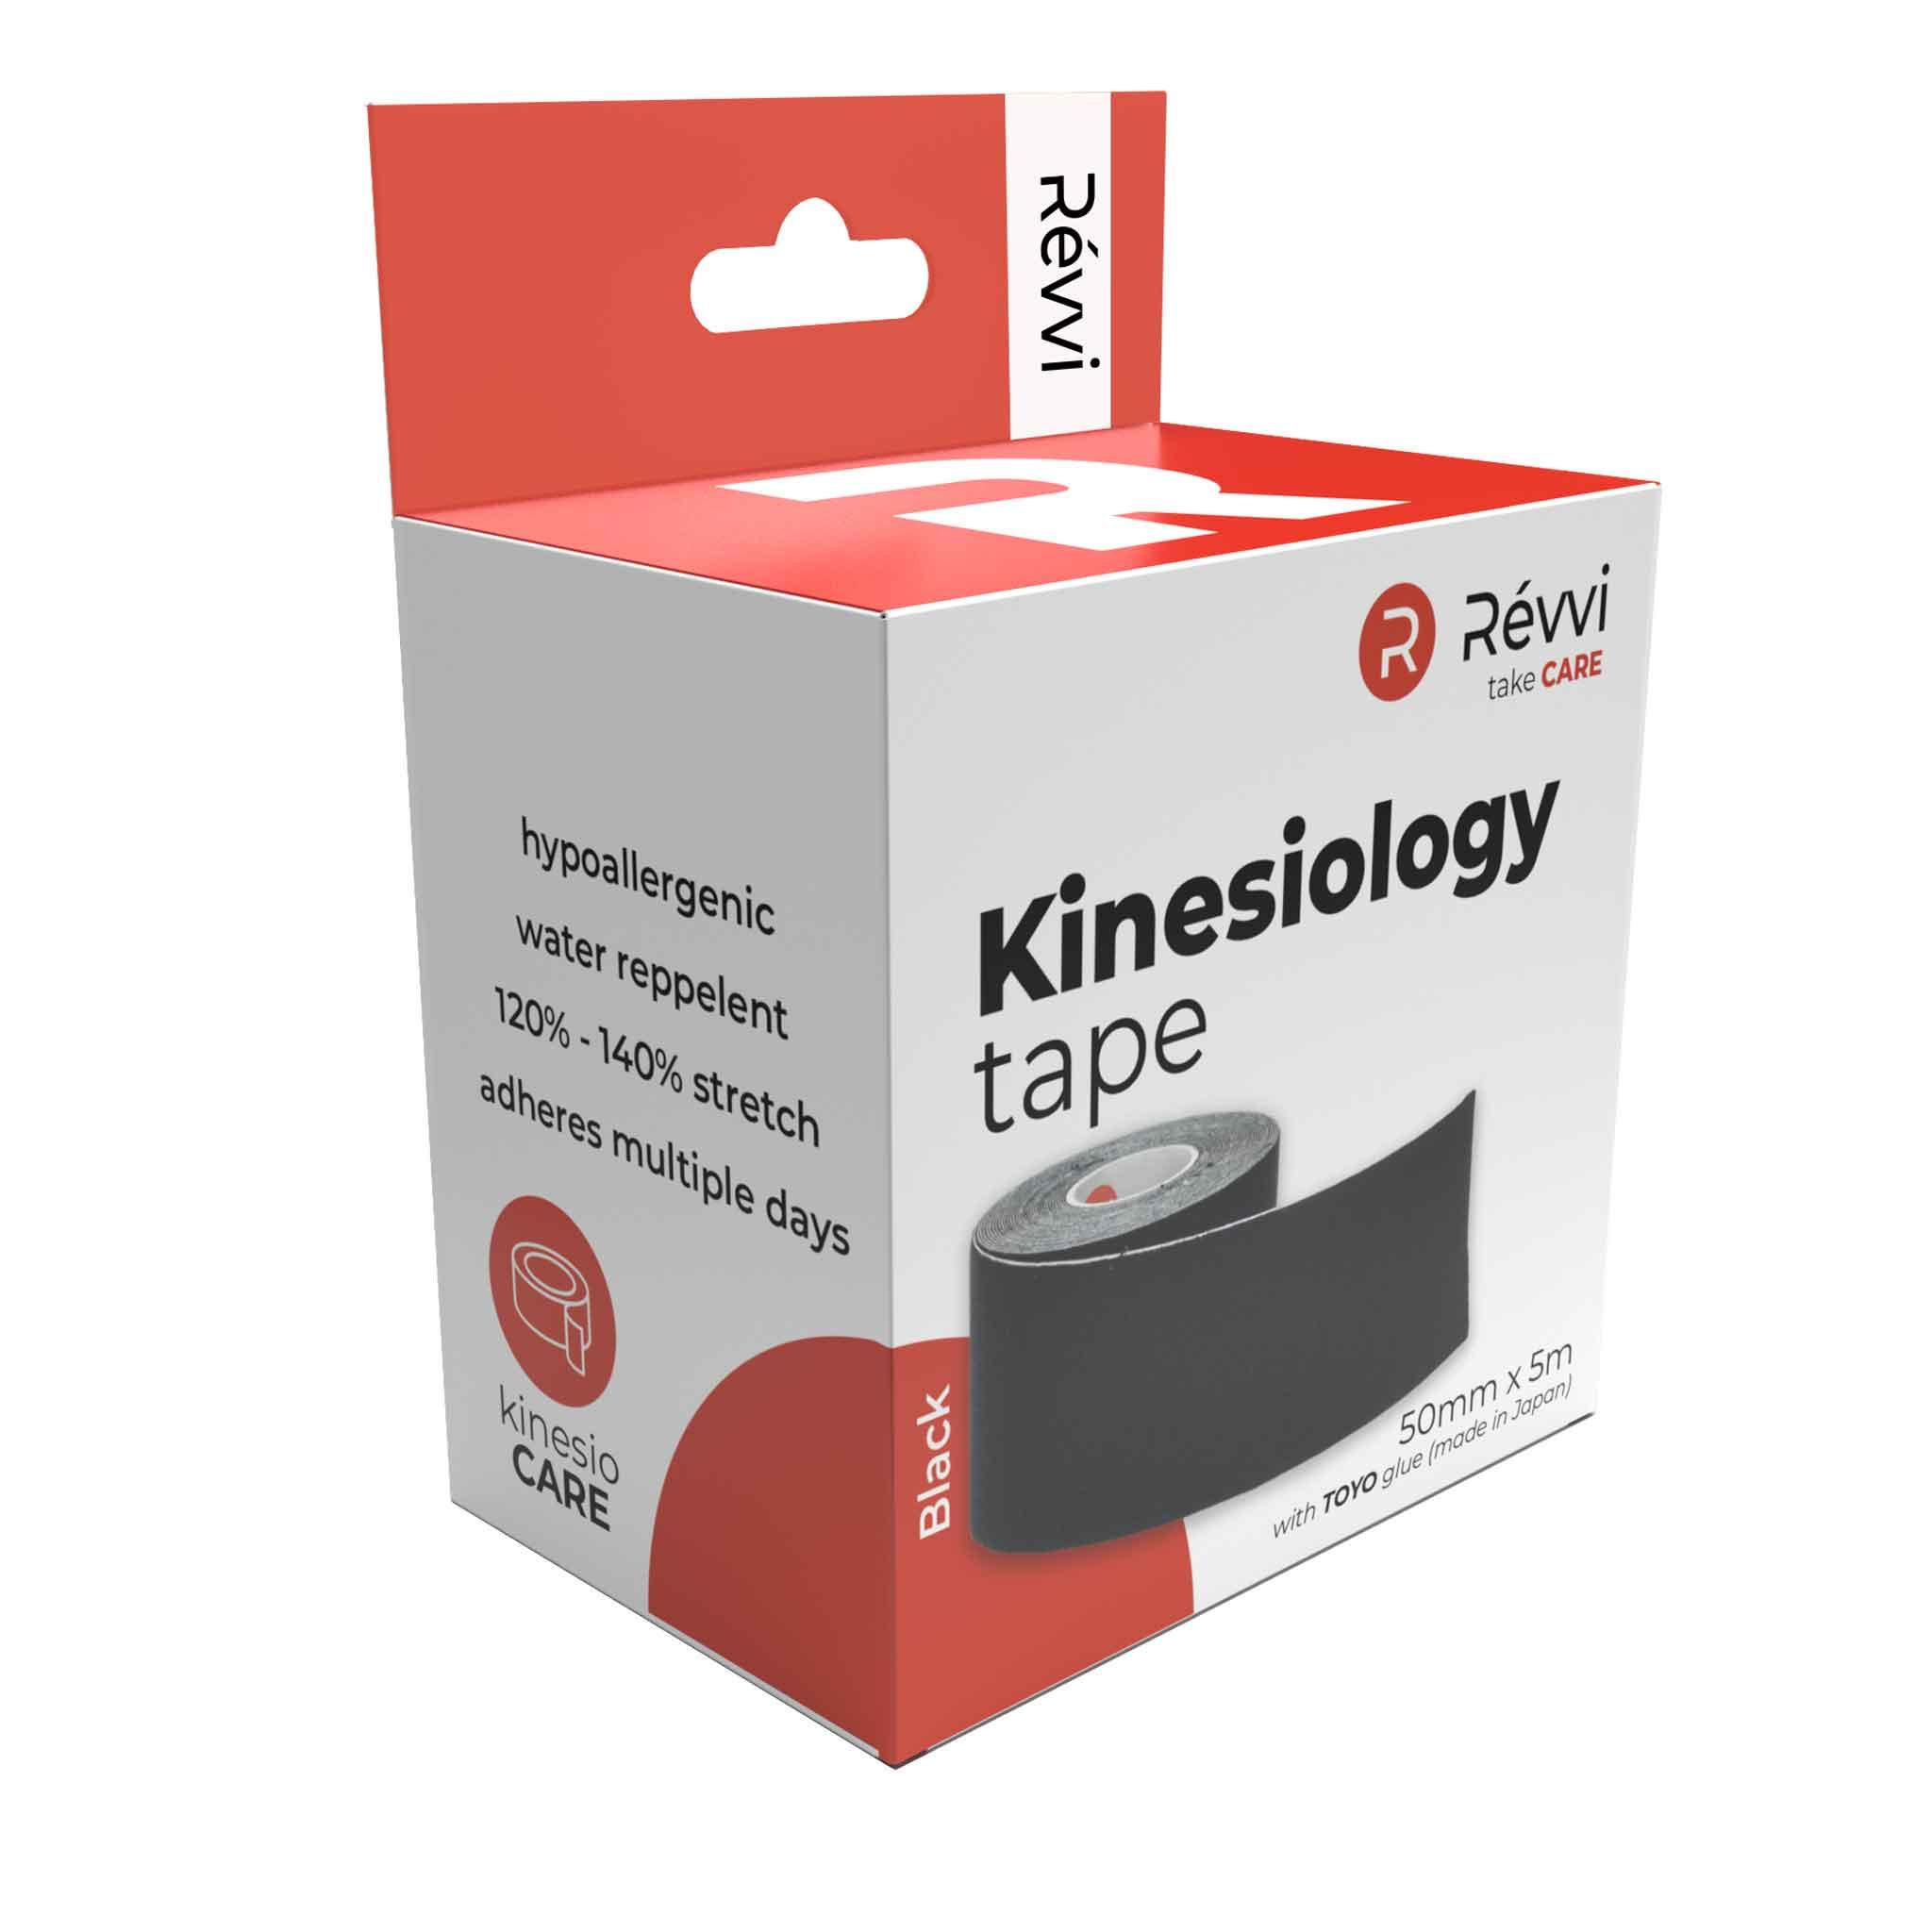 Kenisis - Skin care - Revvi product sock tape